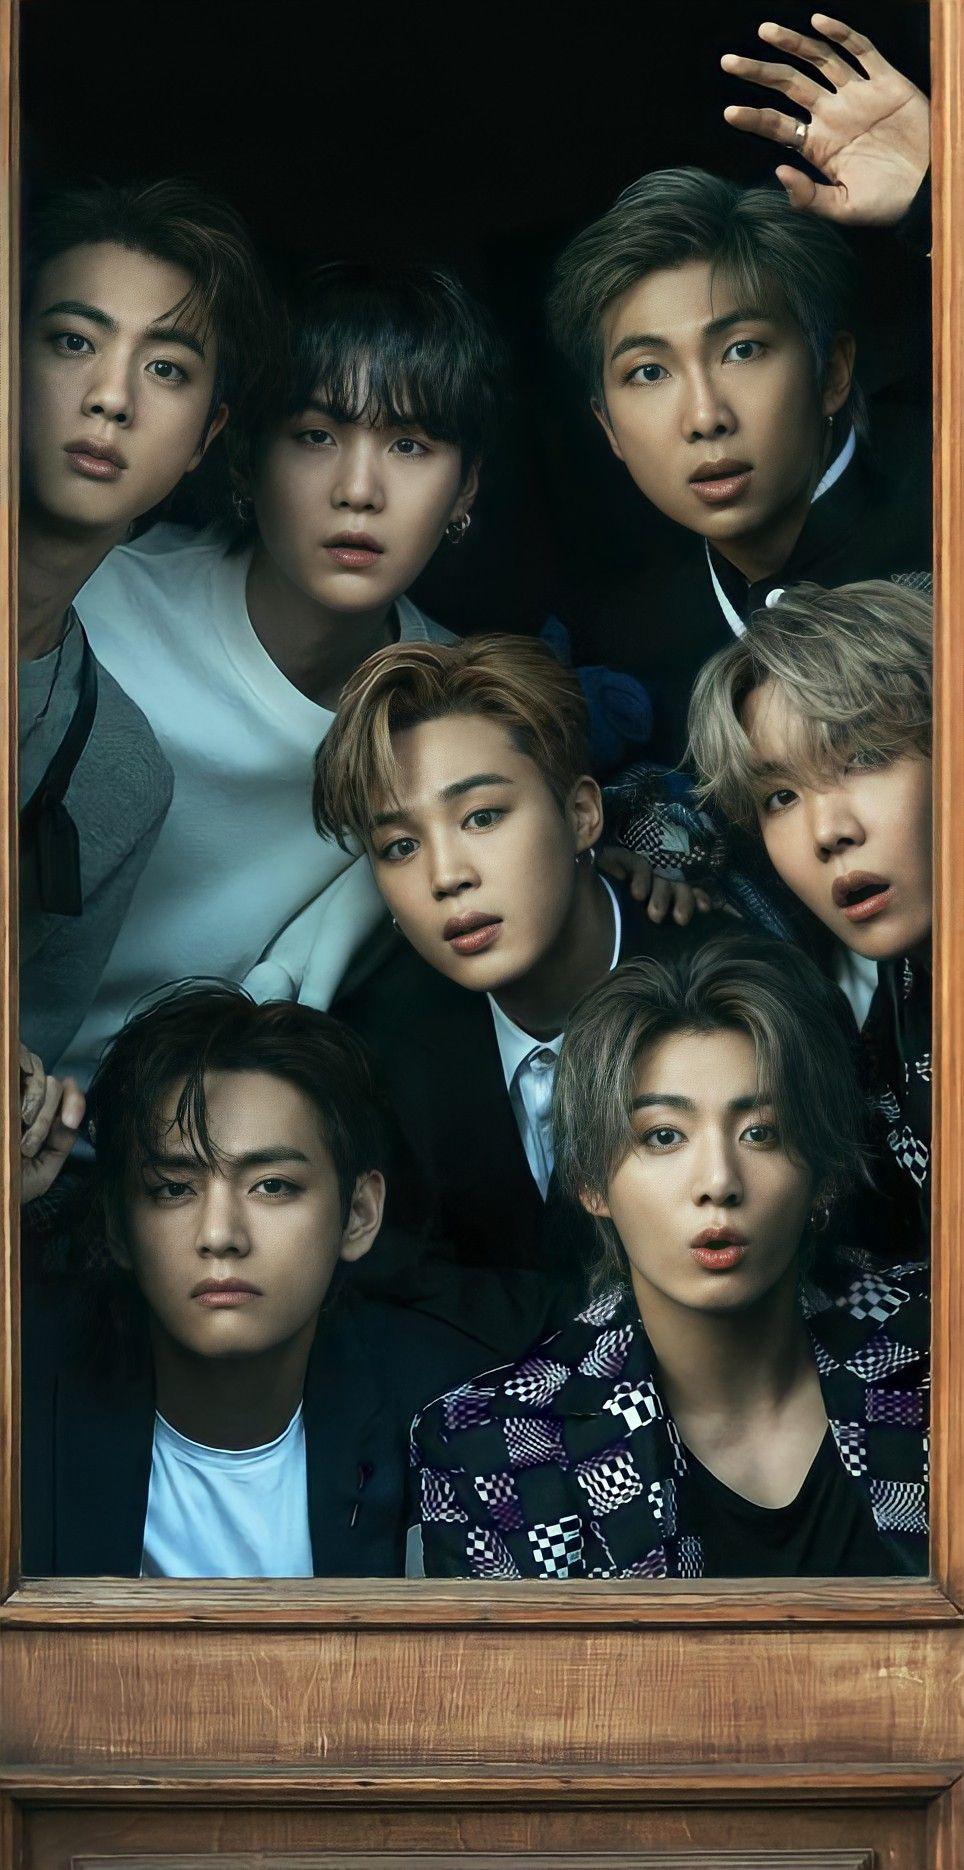 Bts group photo 2021 wallpaper